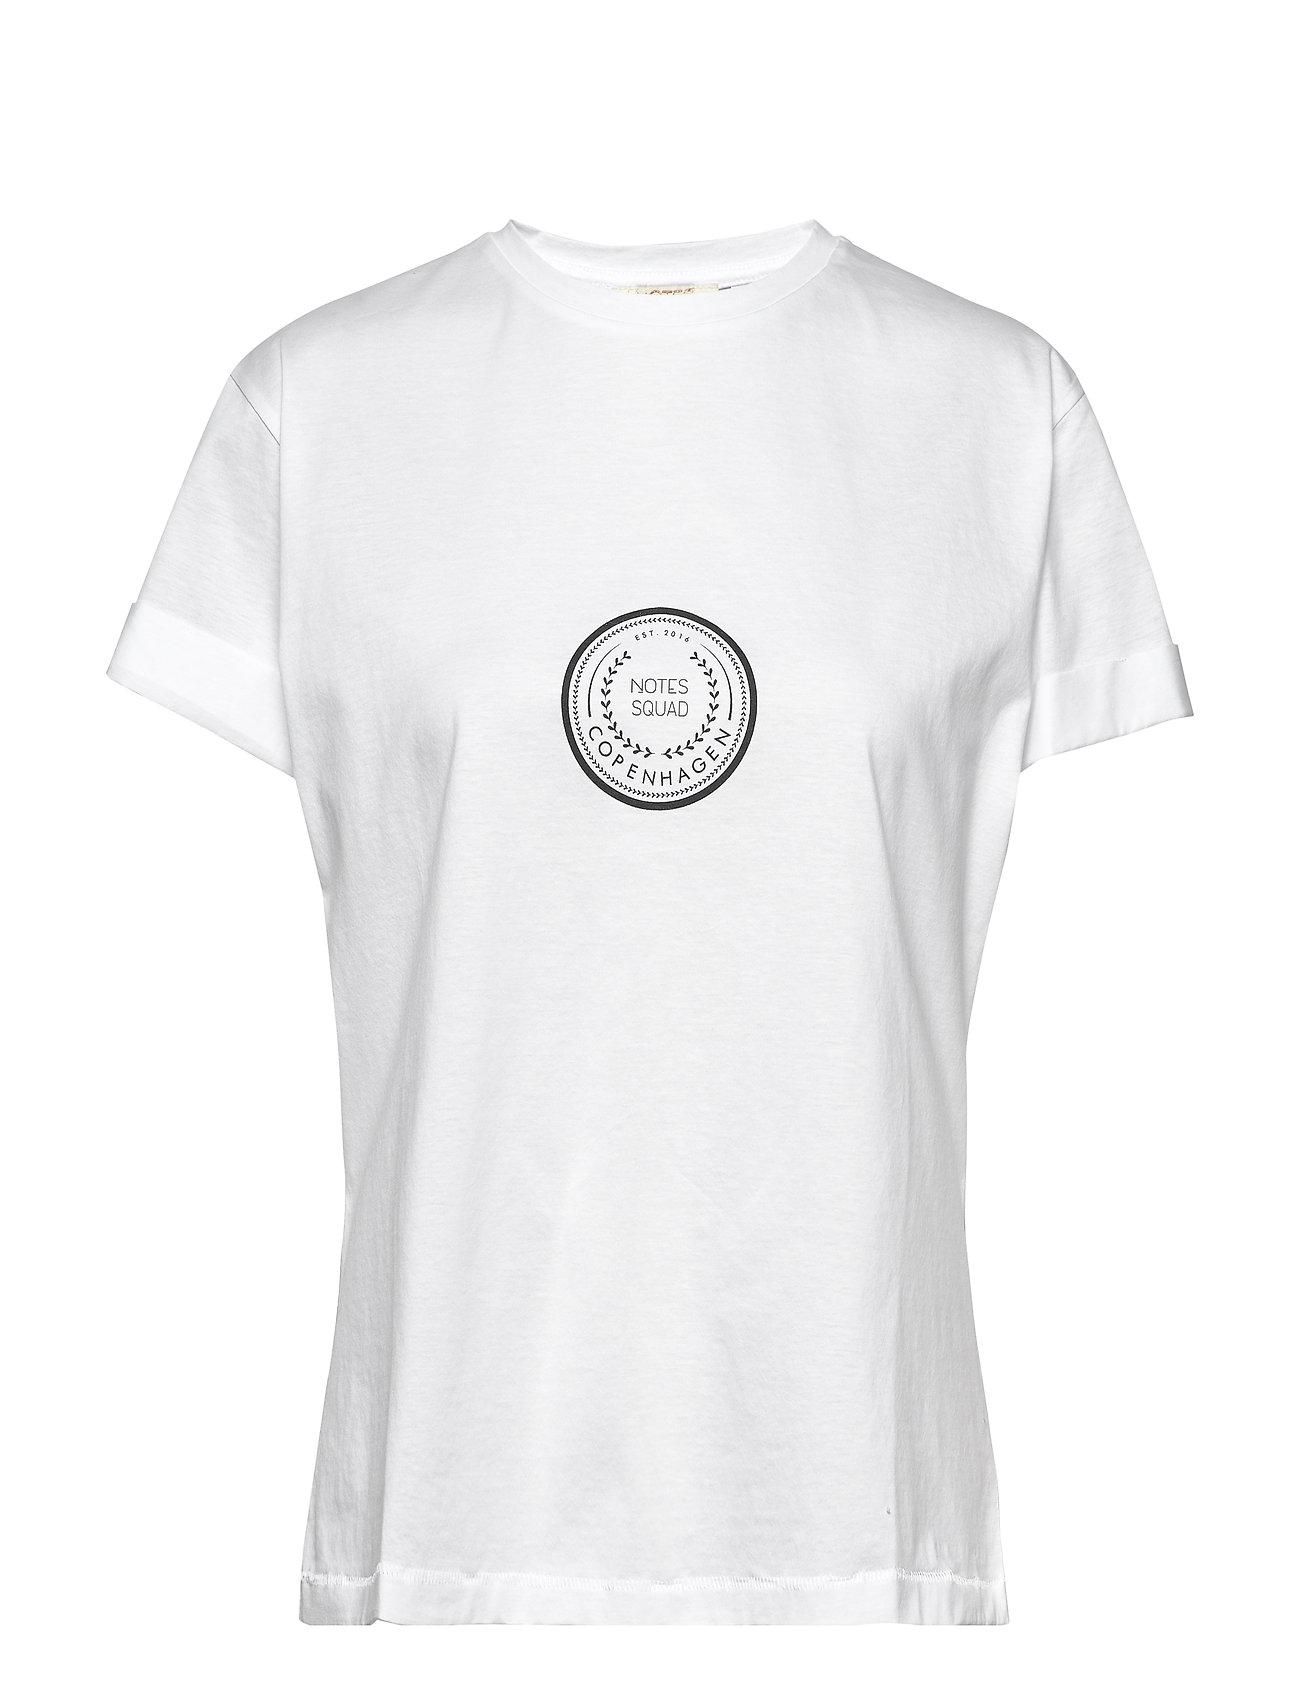 Notes du Nord Olexa T-shirt - WHITE